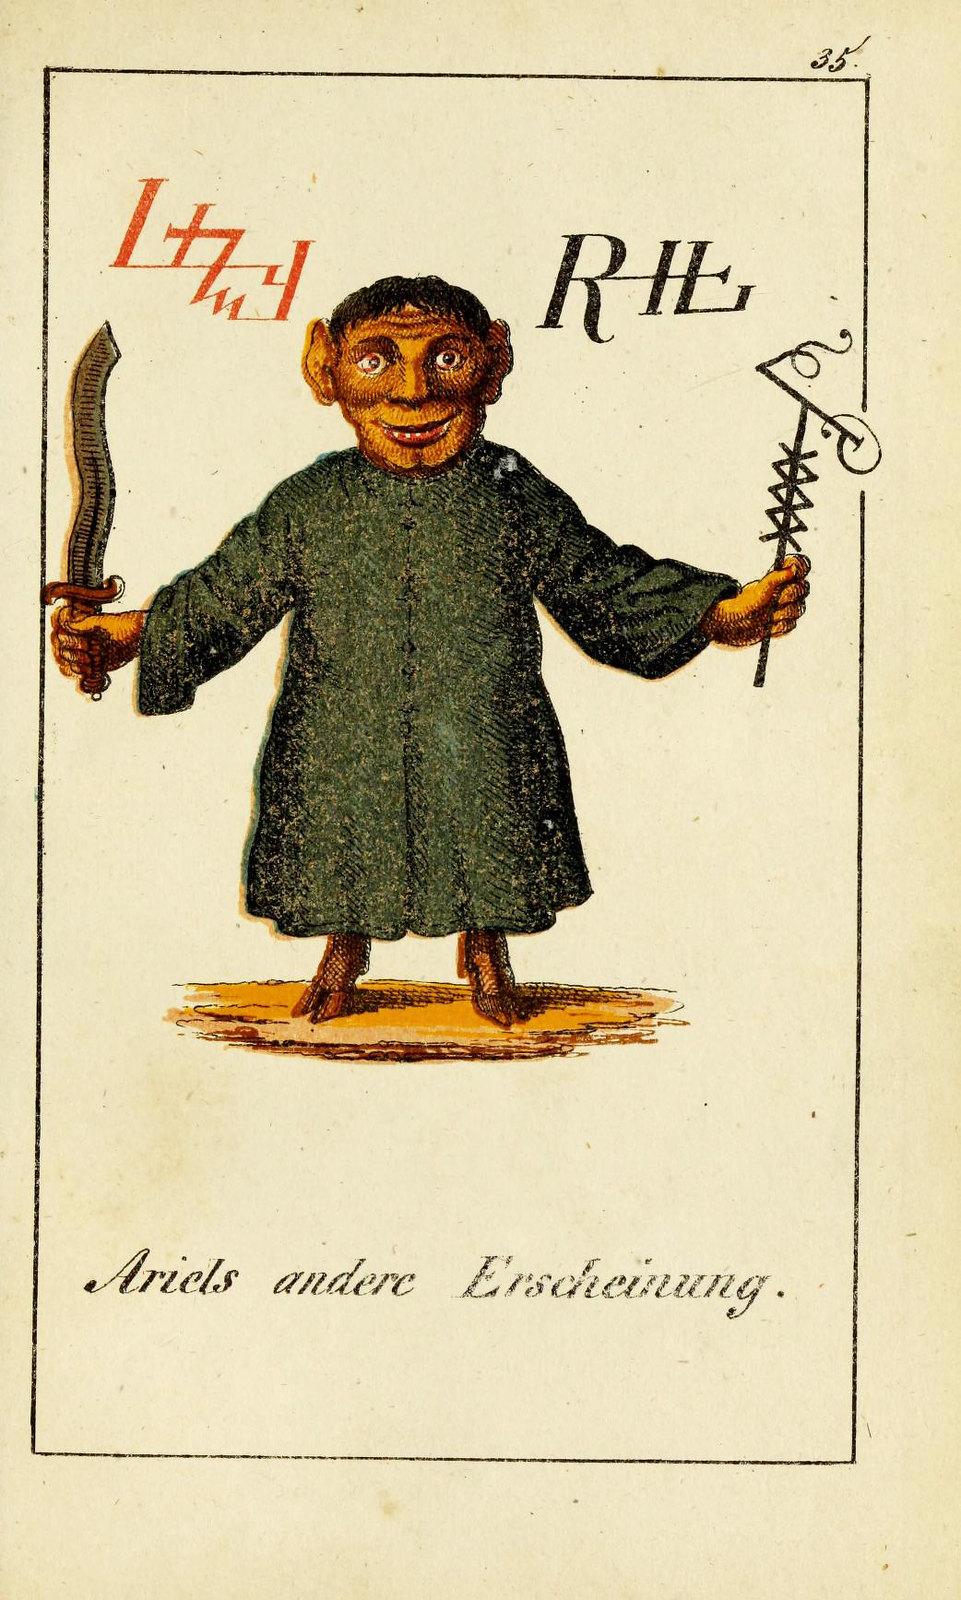 Johann Scheible - Doktor Johannes Faust's Magia naturalis et innaturalis, 1849 (6)